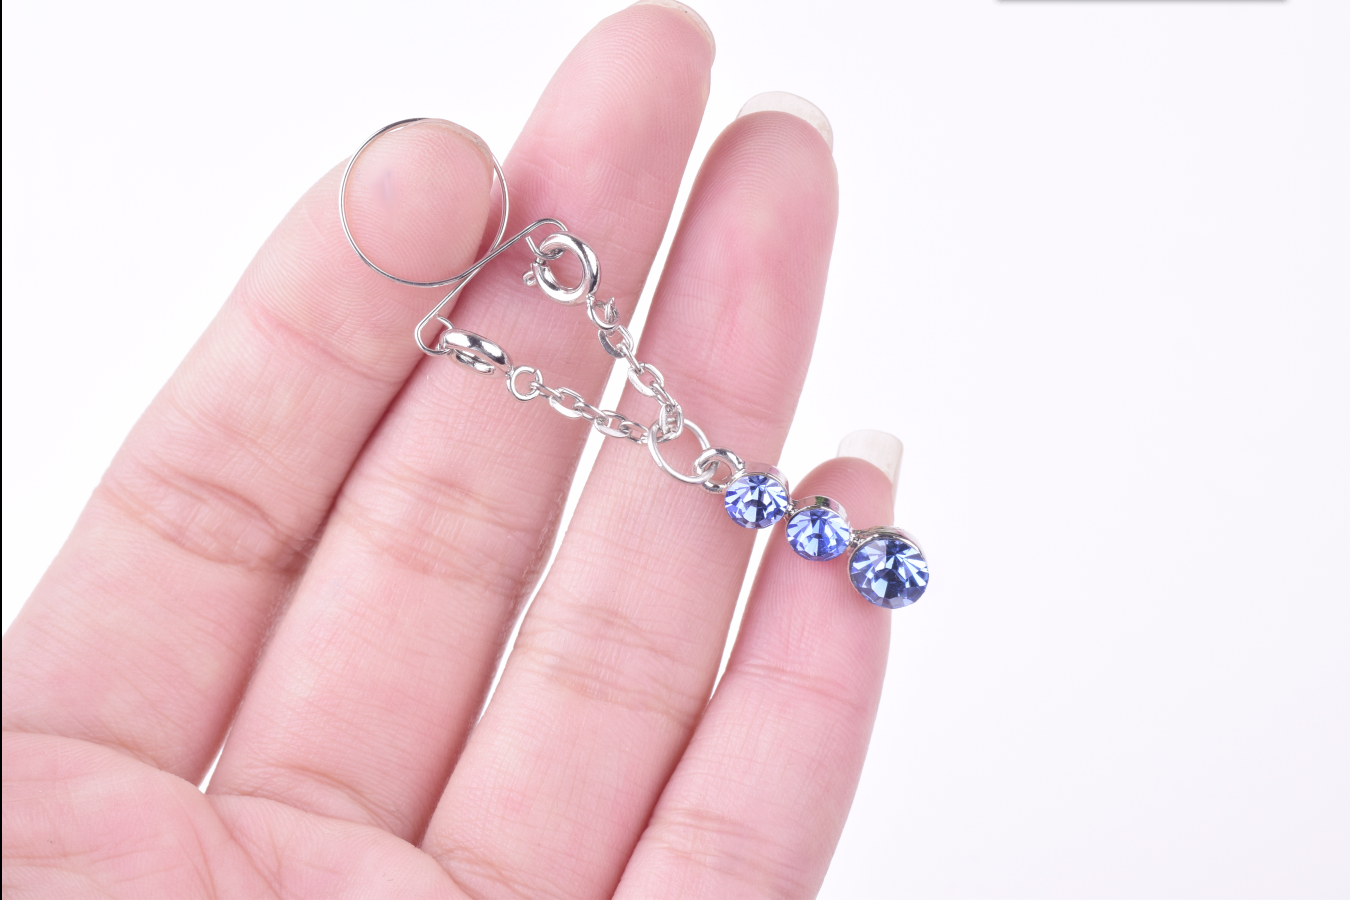 1 Pair Sexy Non Tindik Klip Palsu Puting Cincin Tubuh Perhiasan Berlian Imitasi Penutup Klem Mainan Seks Dewasa Tindik Dapat Disesuaikan ukuran